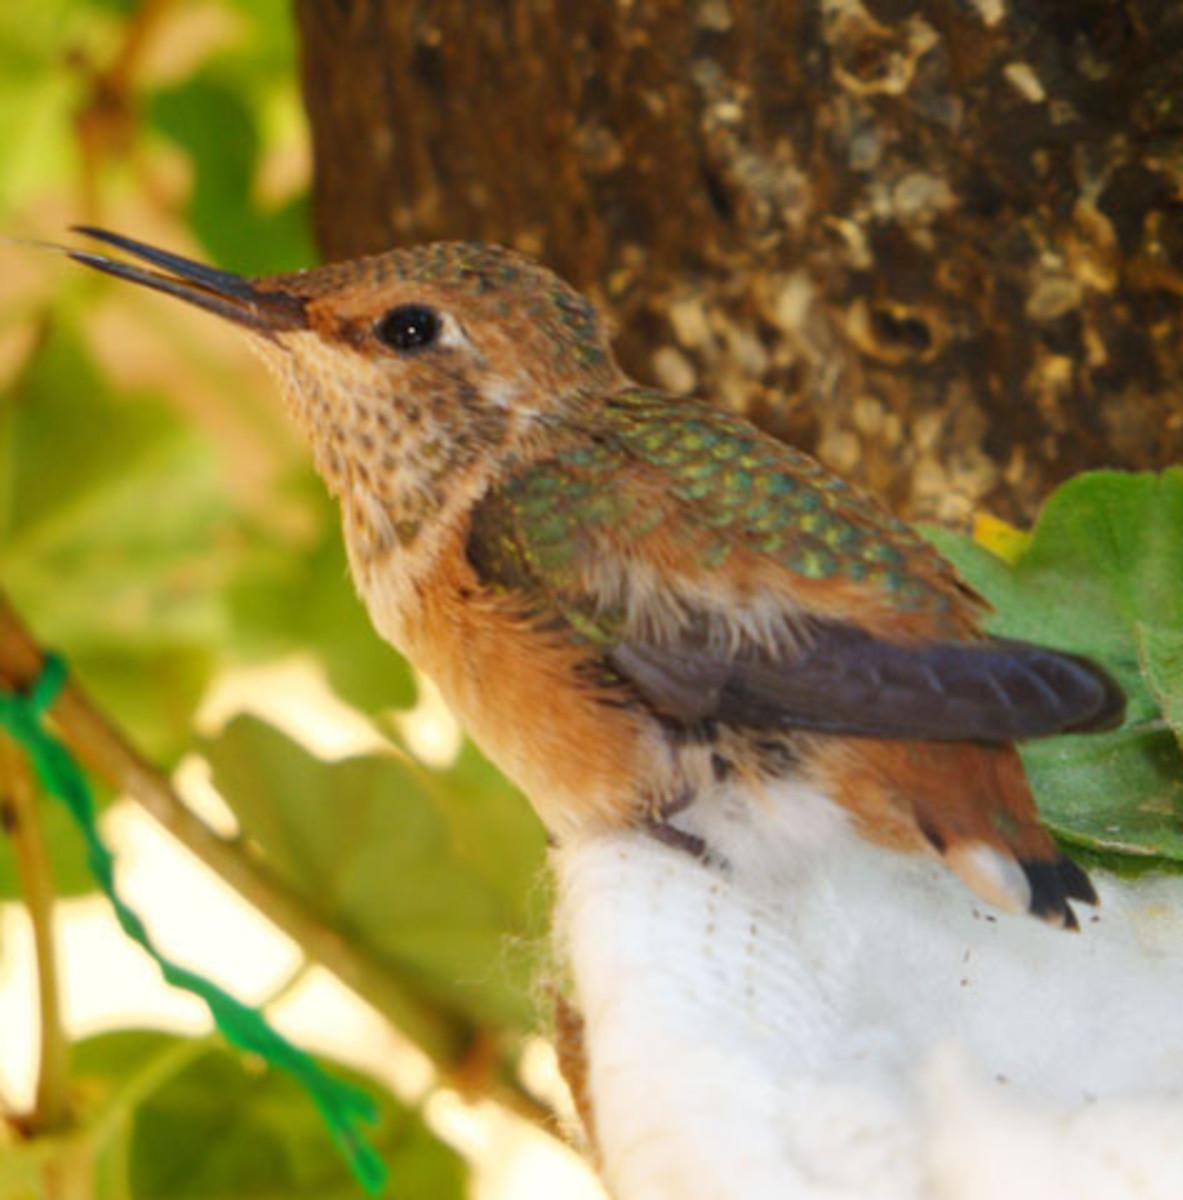 Sasi, the little fledgling